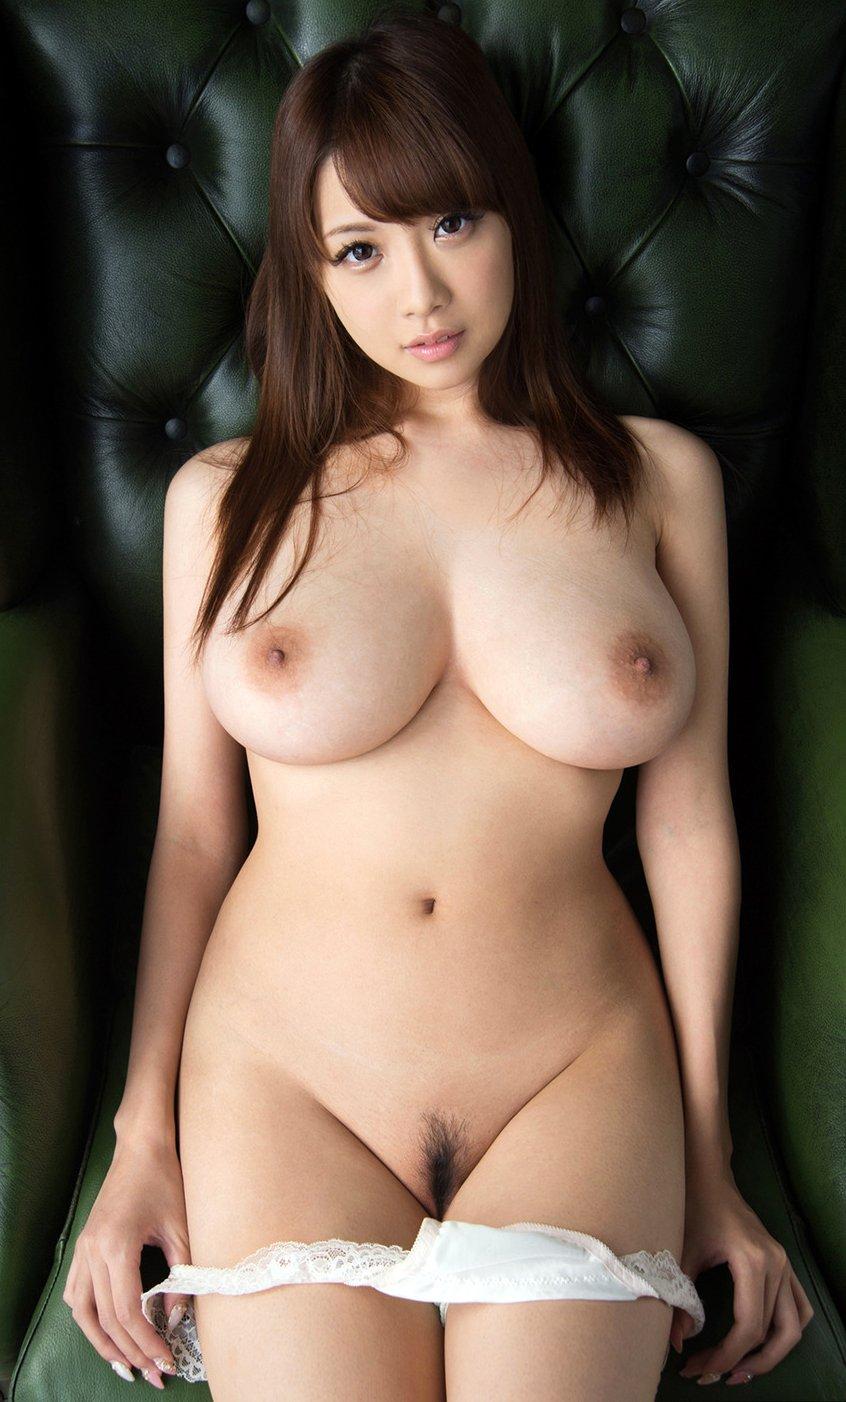 Hot busty asian